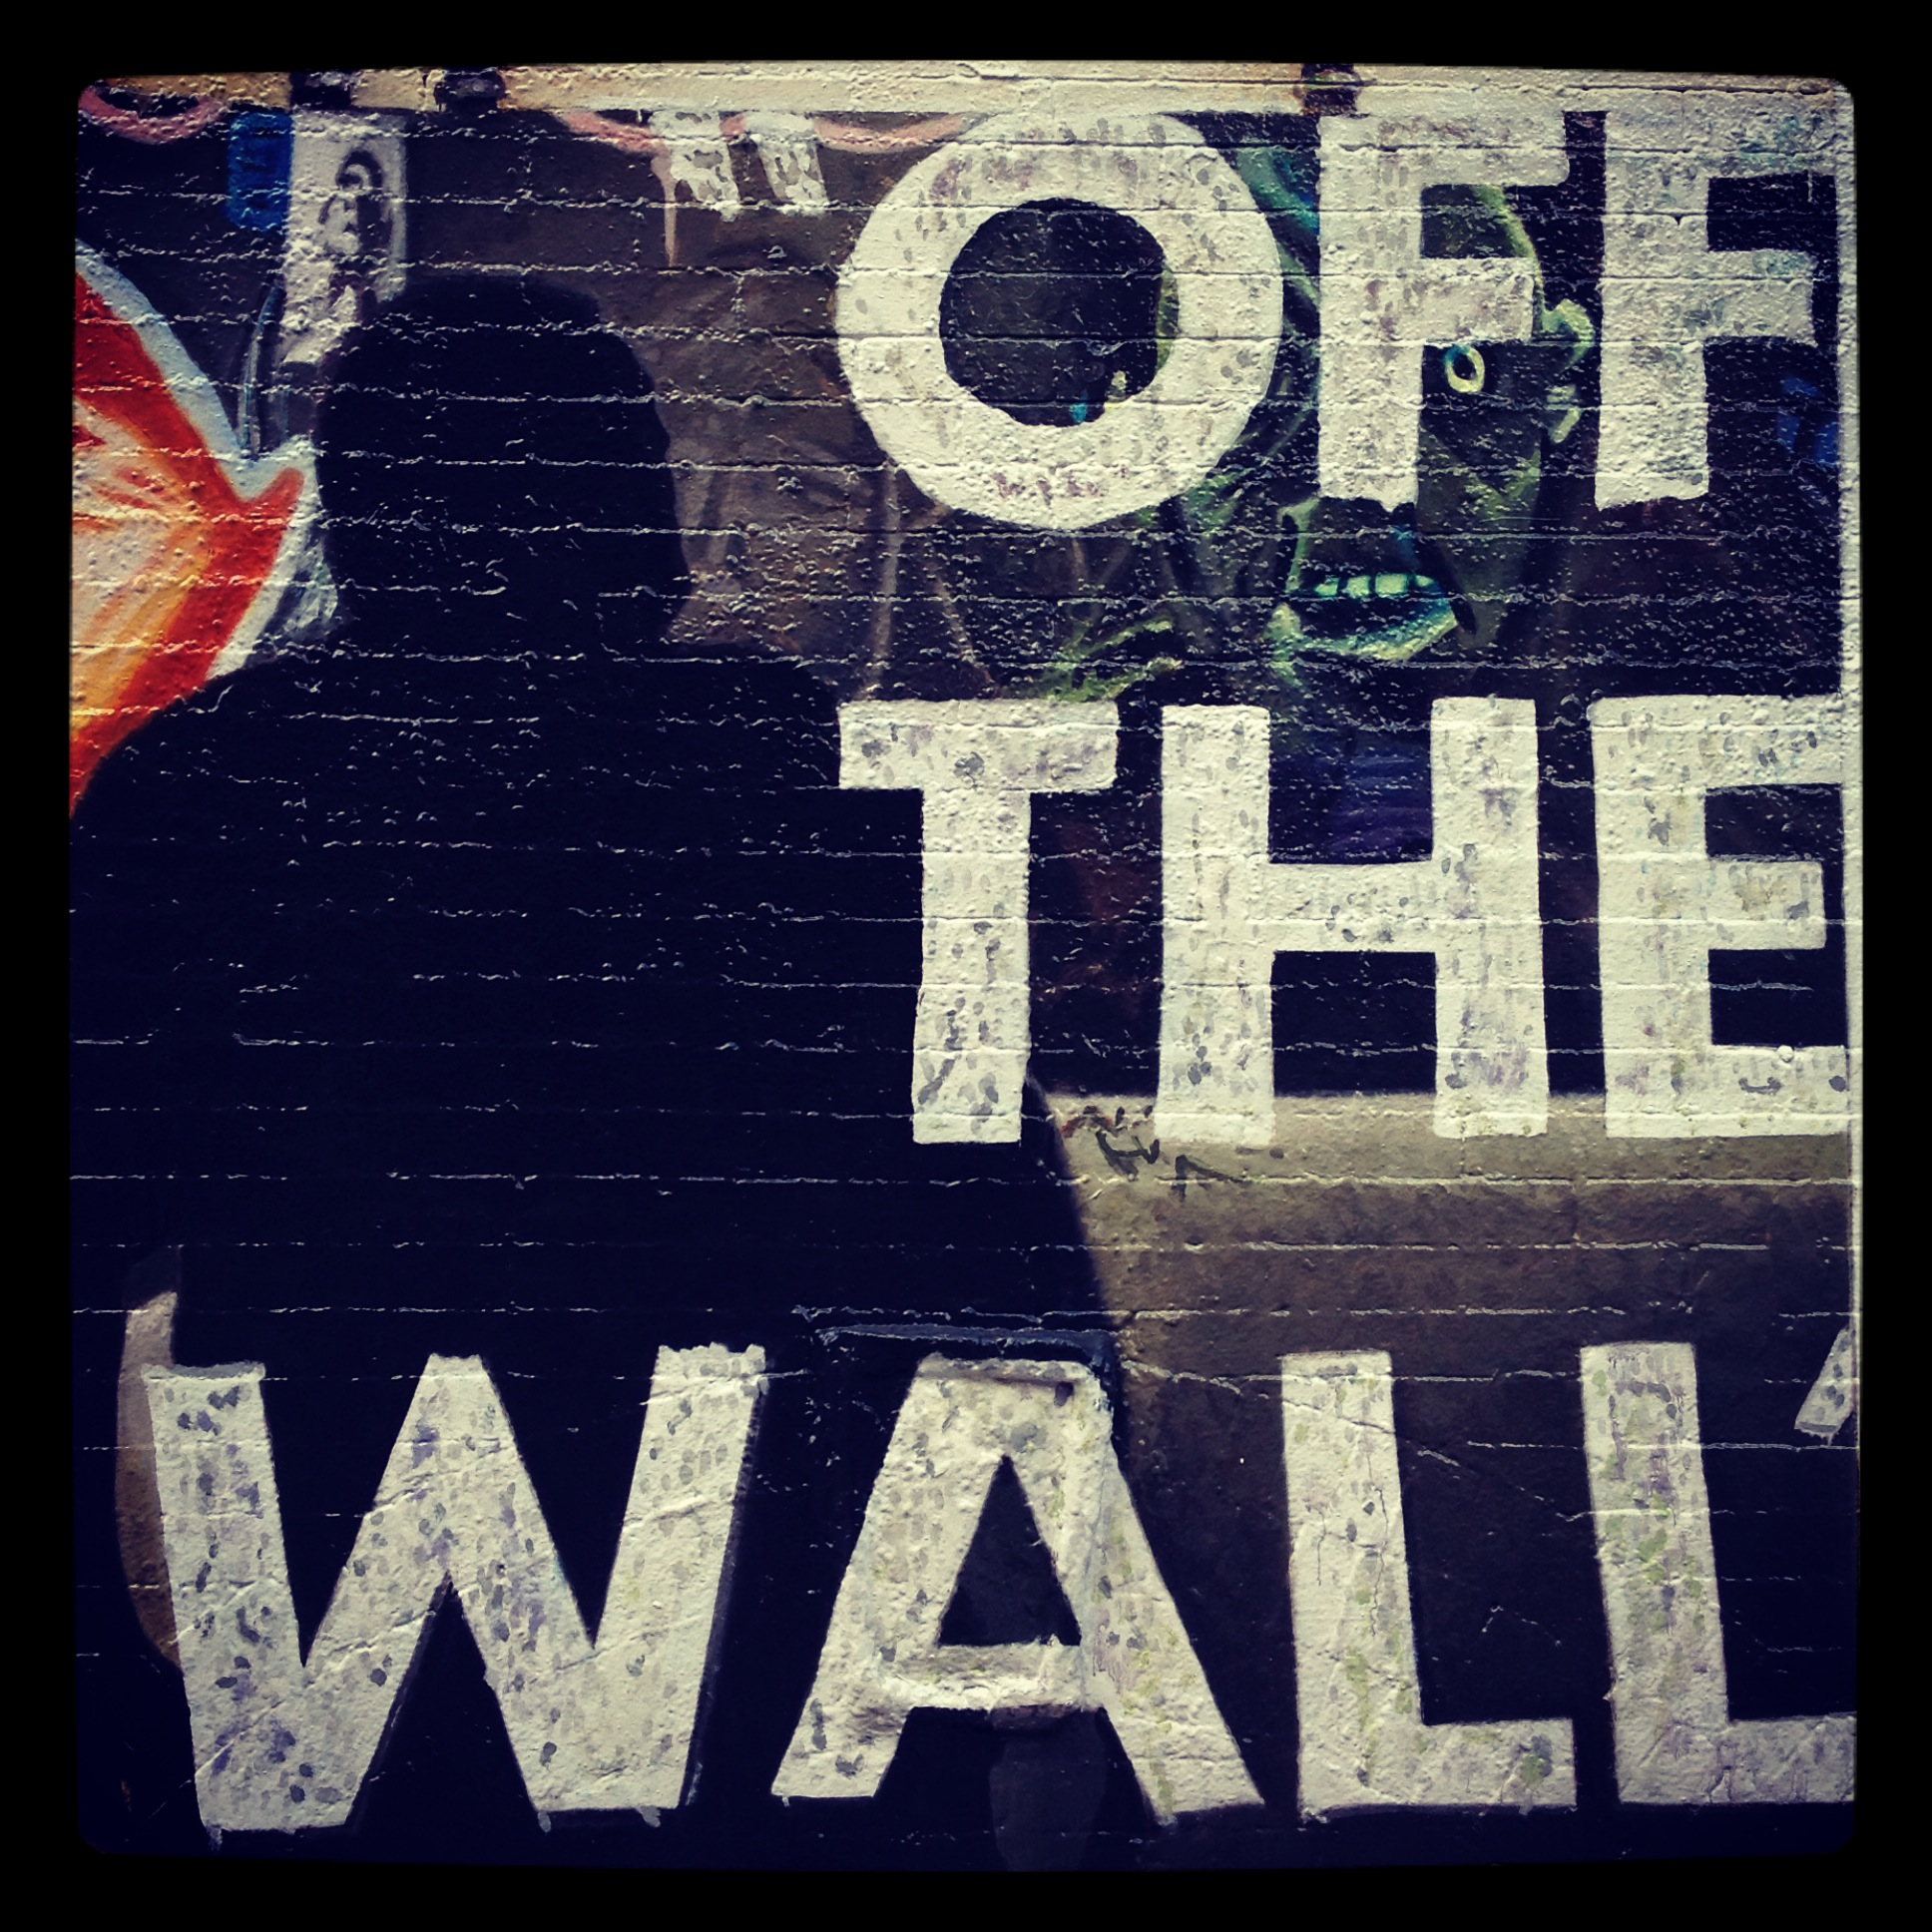 NYC STREET ART: VANS OFF THE WALL  TOKIDOKI (NOMAD)